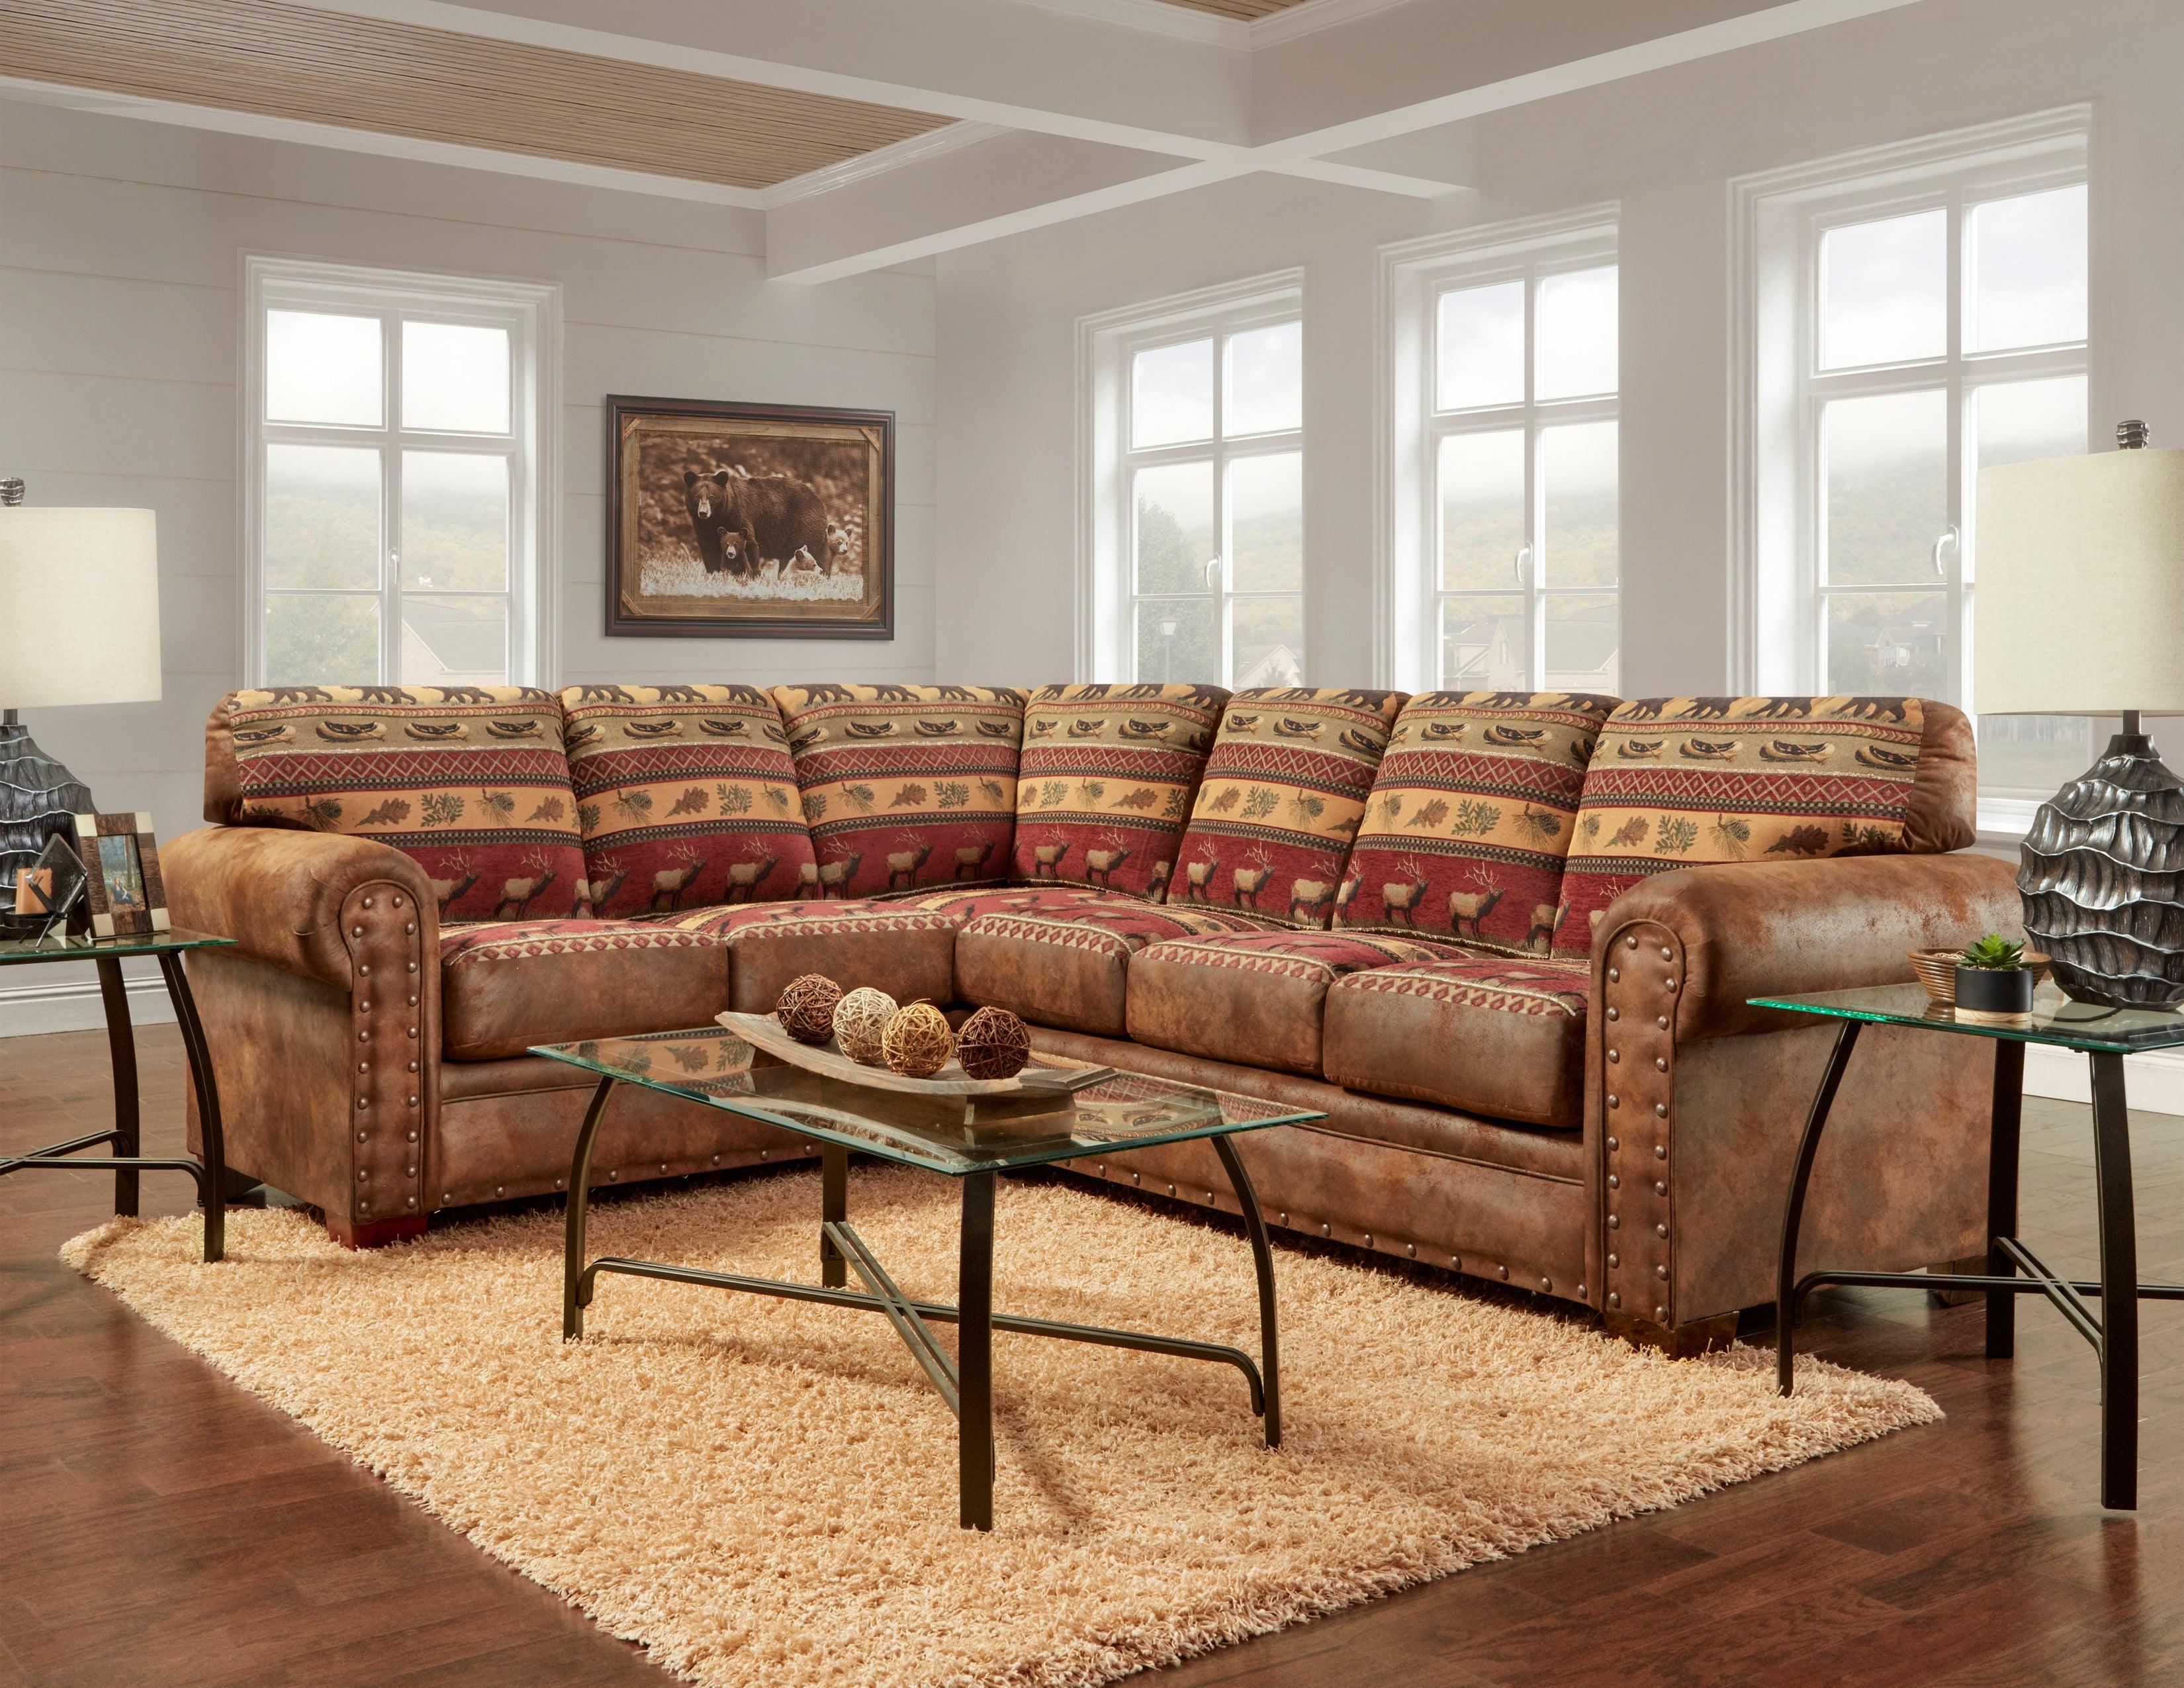 American Furniture Classics Model B1650k Sierra Lodge Two Piece